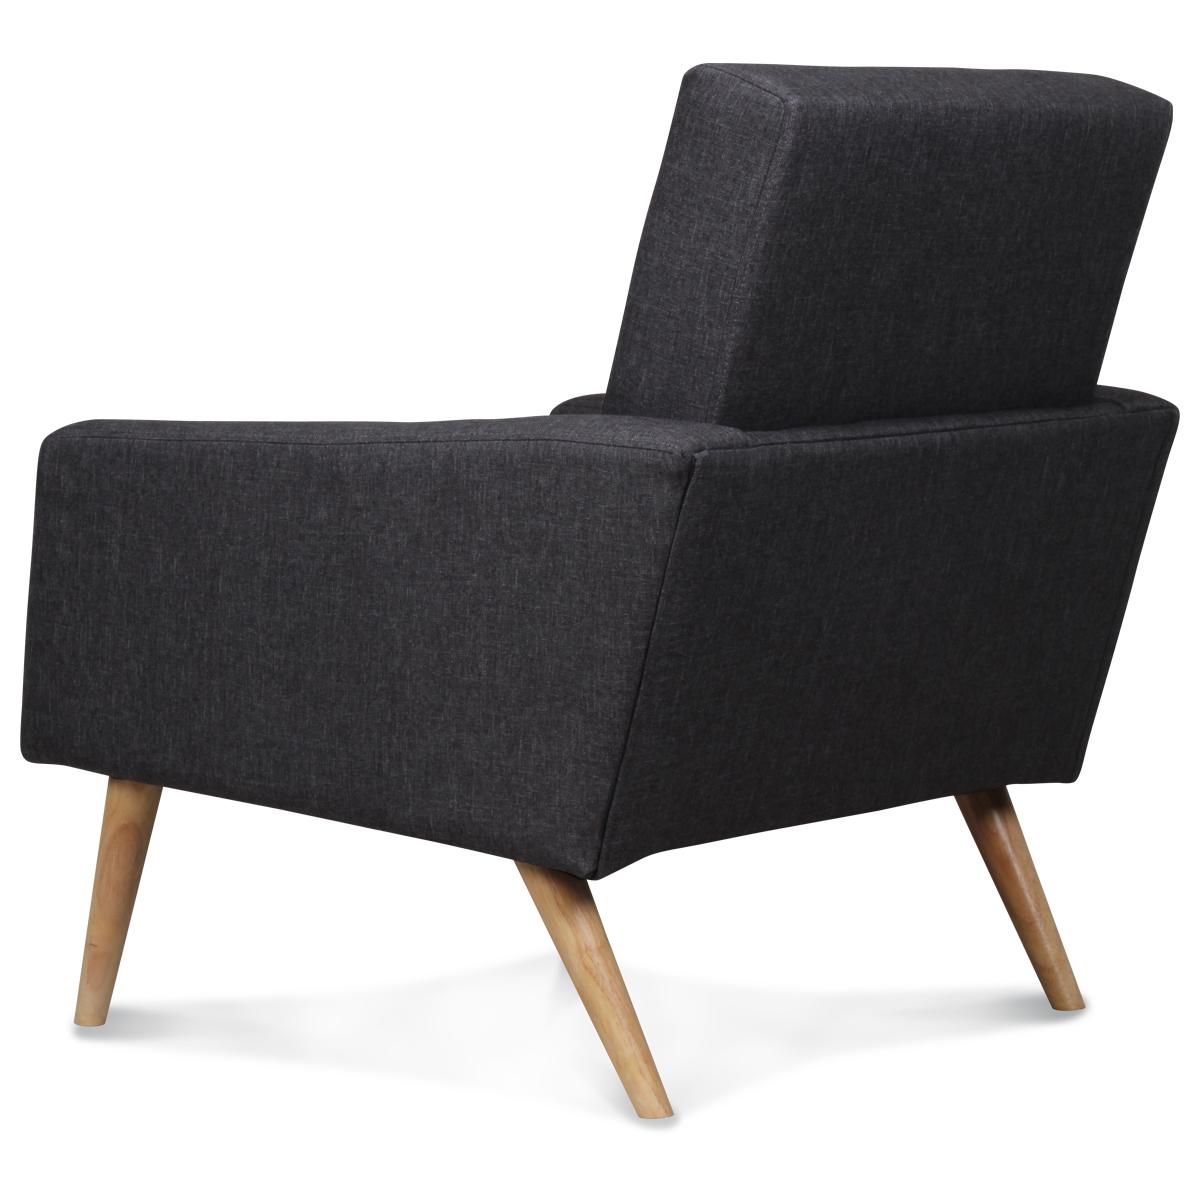 Fauteuil design scandinave moderne gris anthracite fitz demeure et jardin - Moderne fauteuils ...